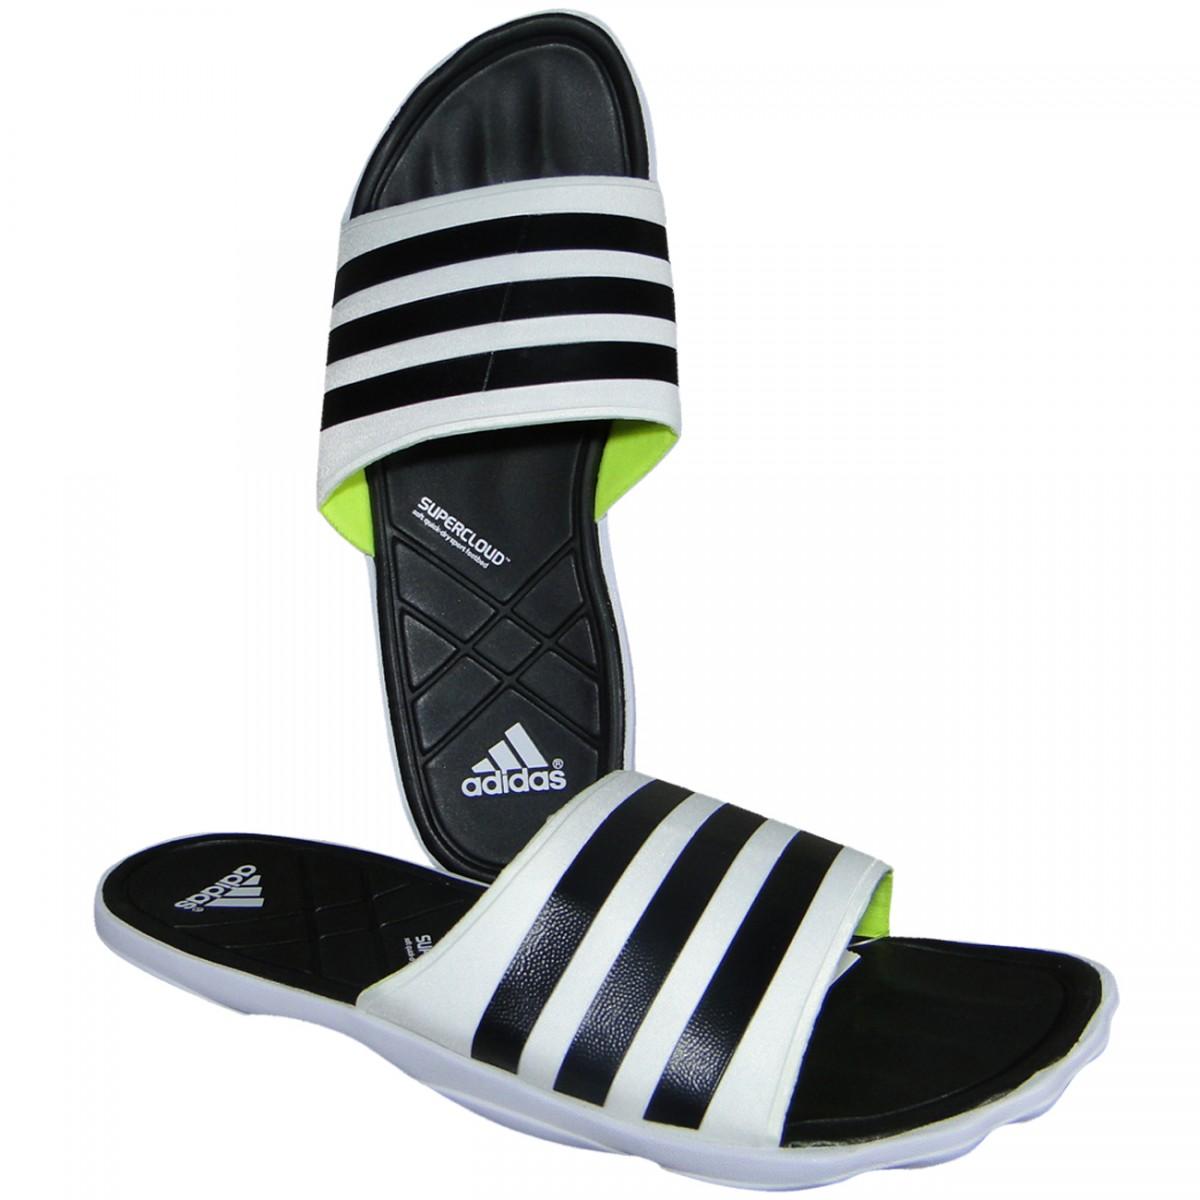 205a68ff5850 ... chinelos nike e adidas Chinelo Adidas Adipure Slide B33744 - Branco  Preto - Chuteira ...